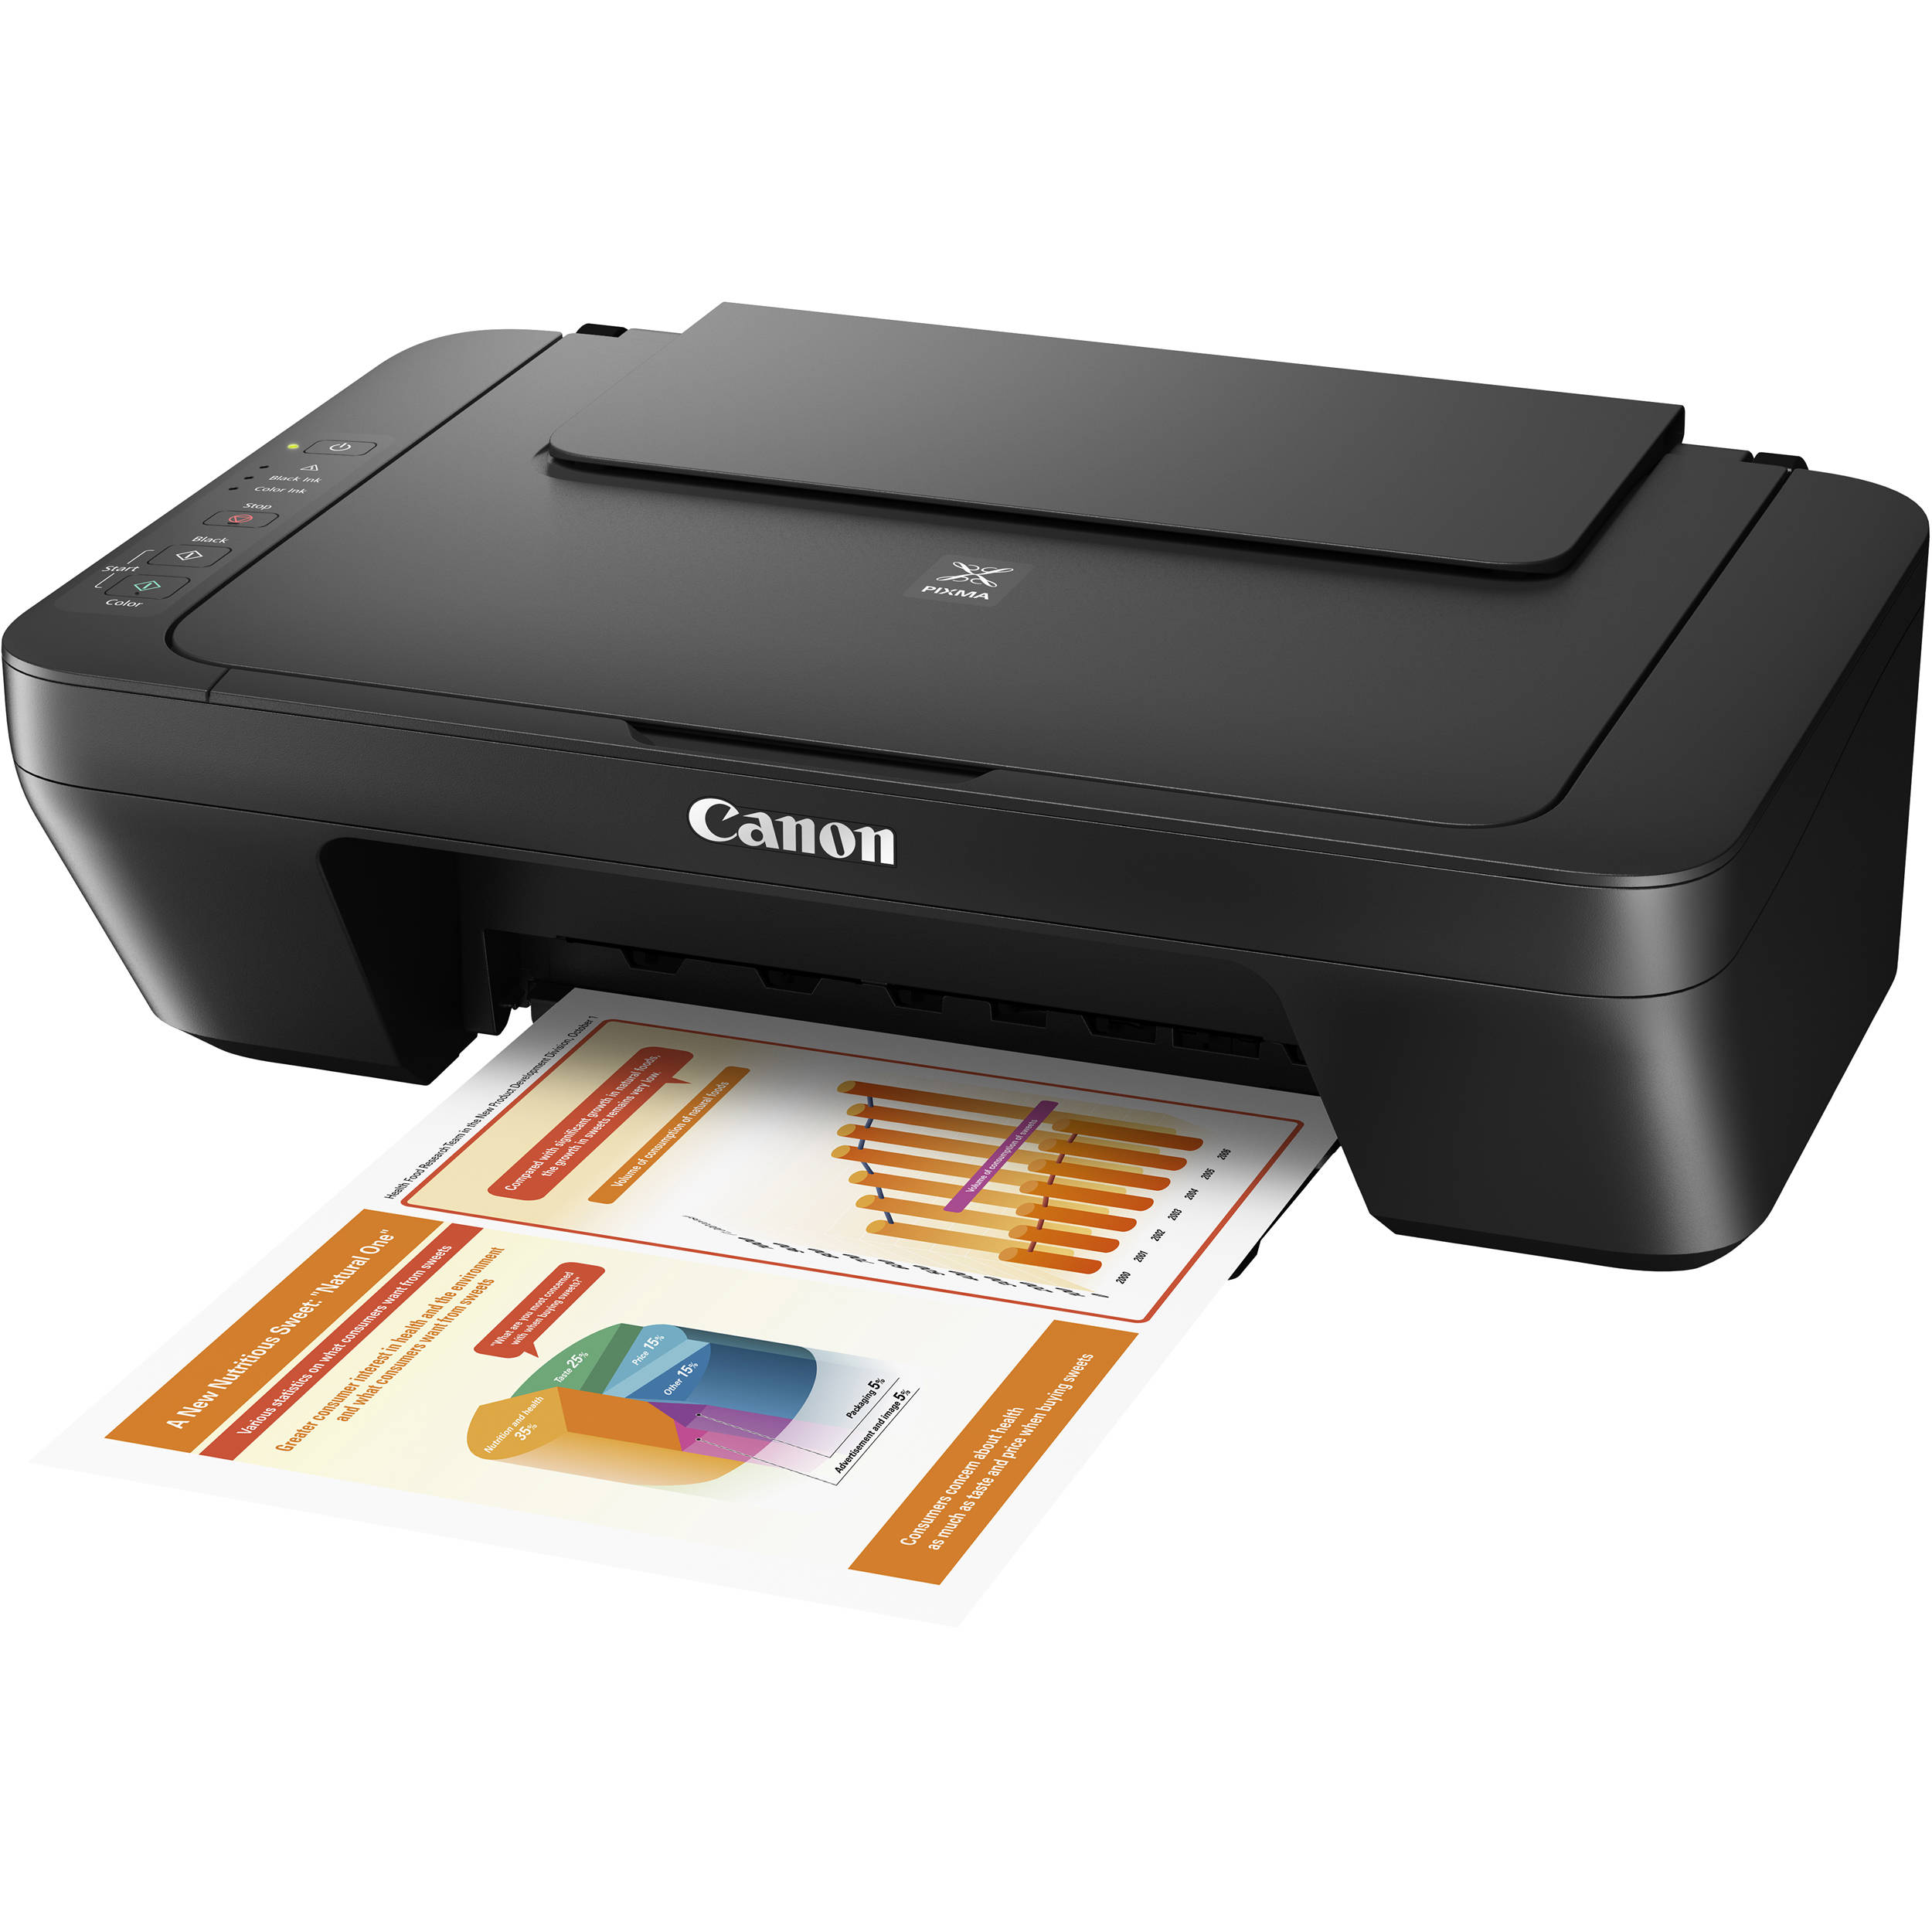 canon pixma mg2525 all in one inkjet printer black 0727c002. Black Bedroom Furniture Sets. Home Design Ideas